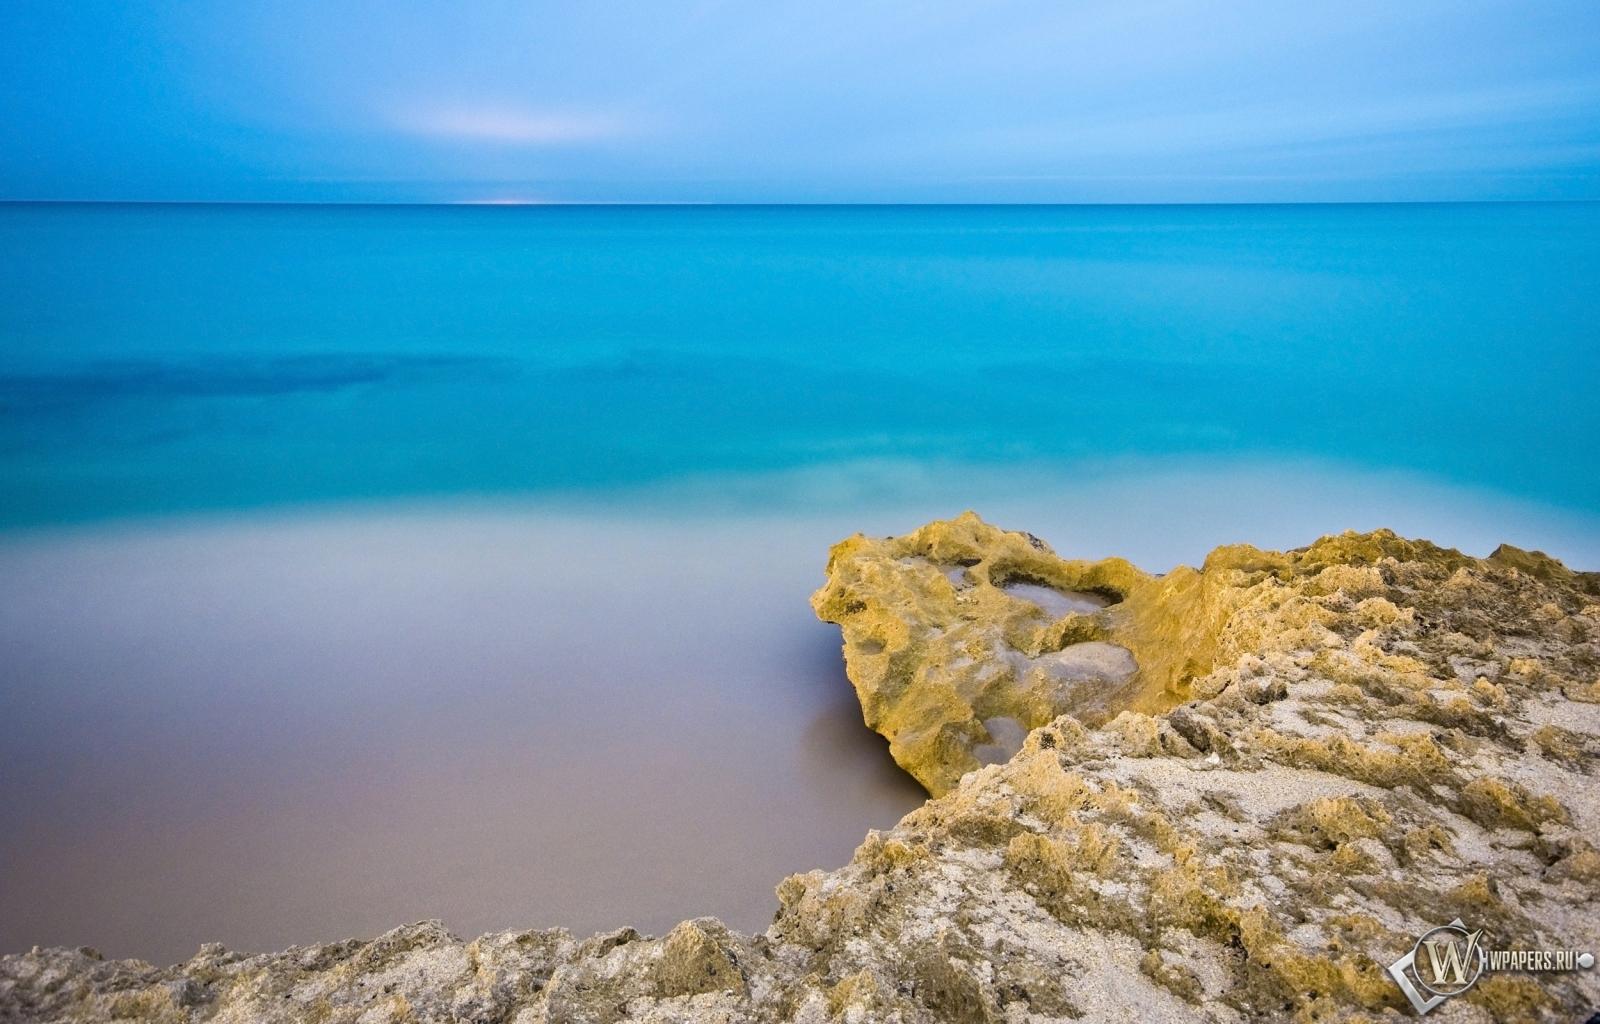 Обои море пляж море небо утро 1600x1024